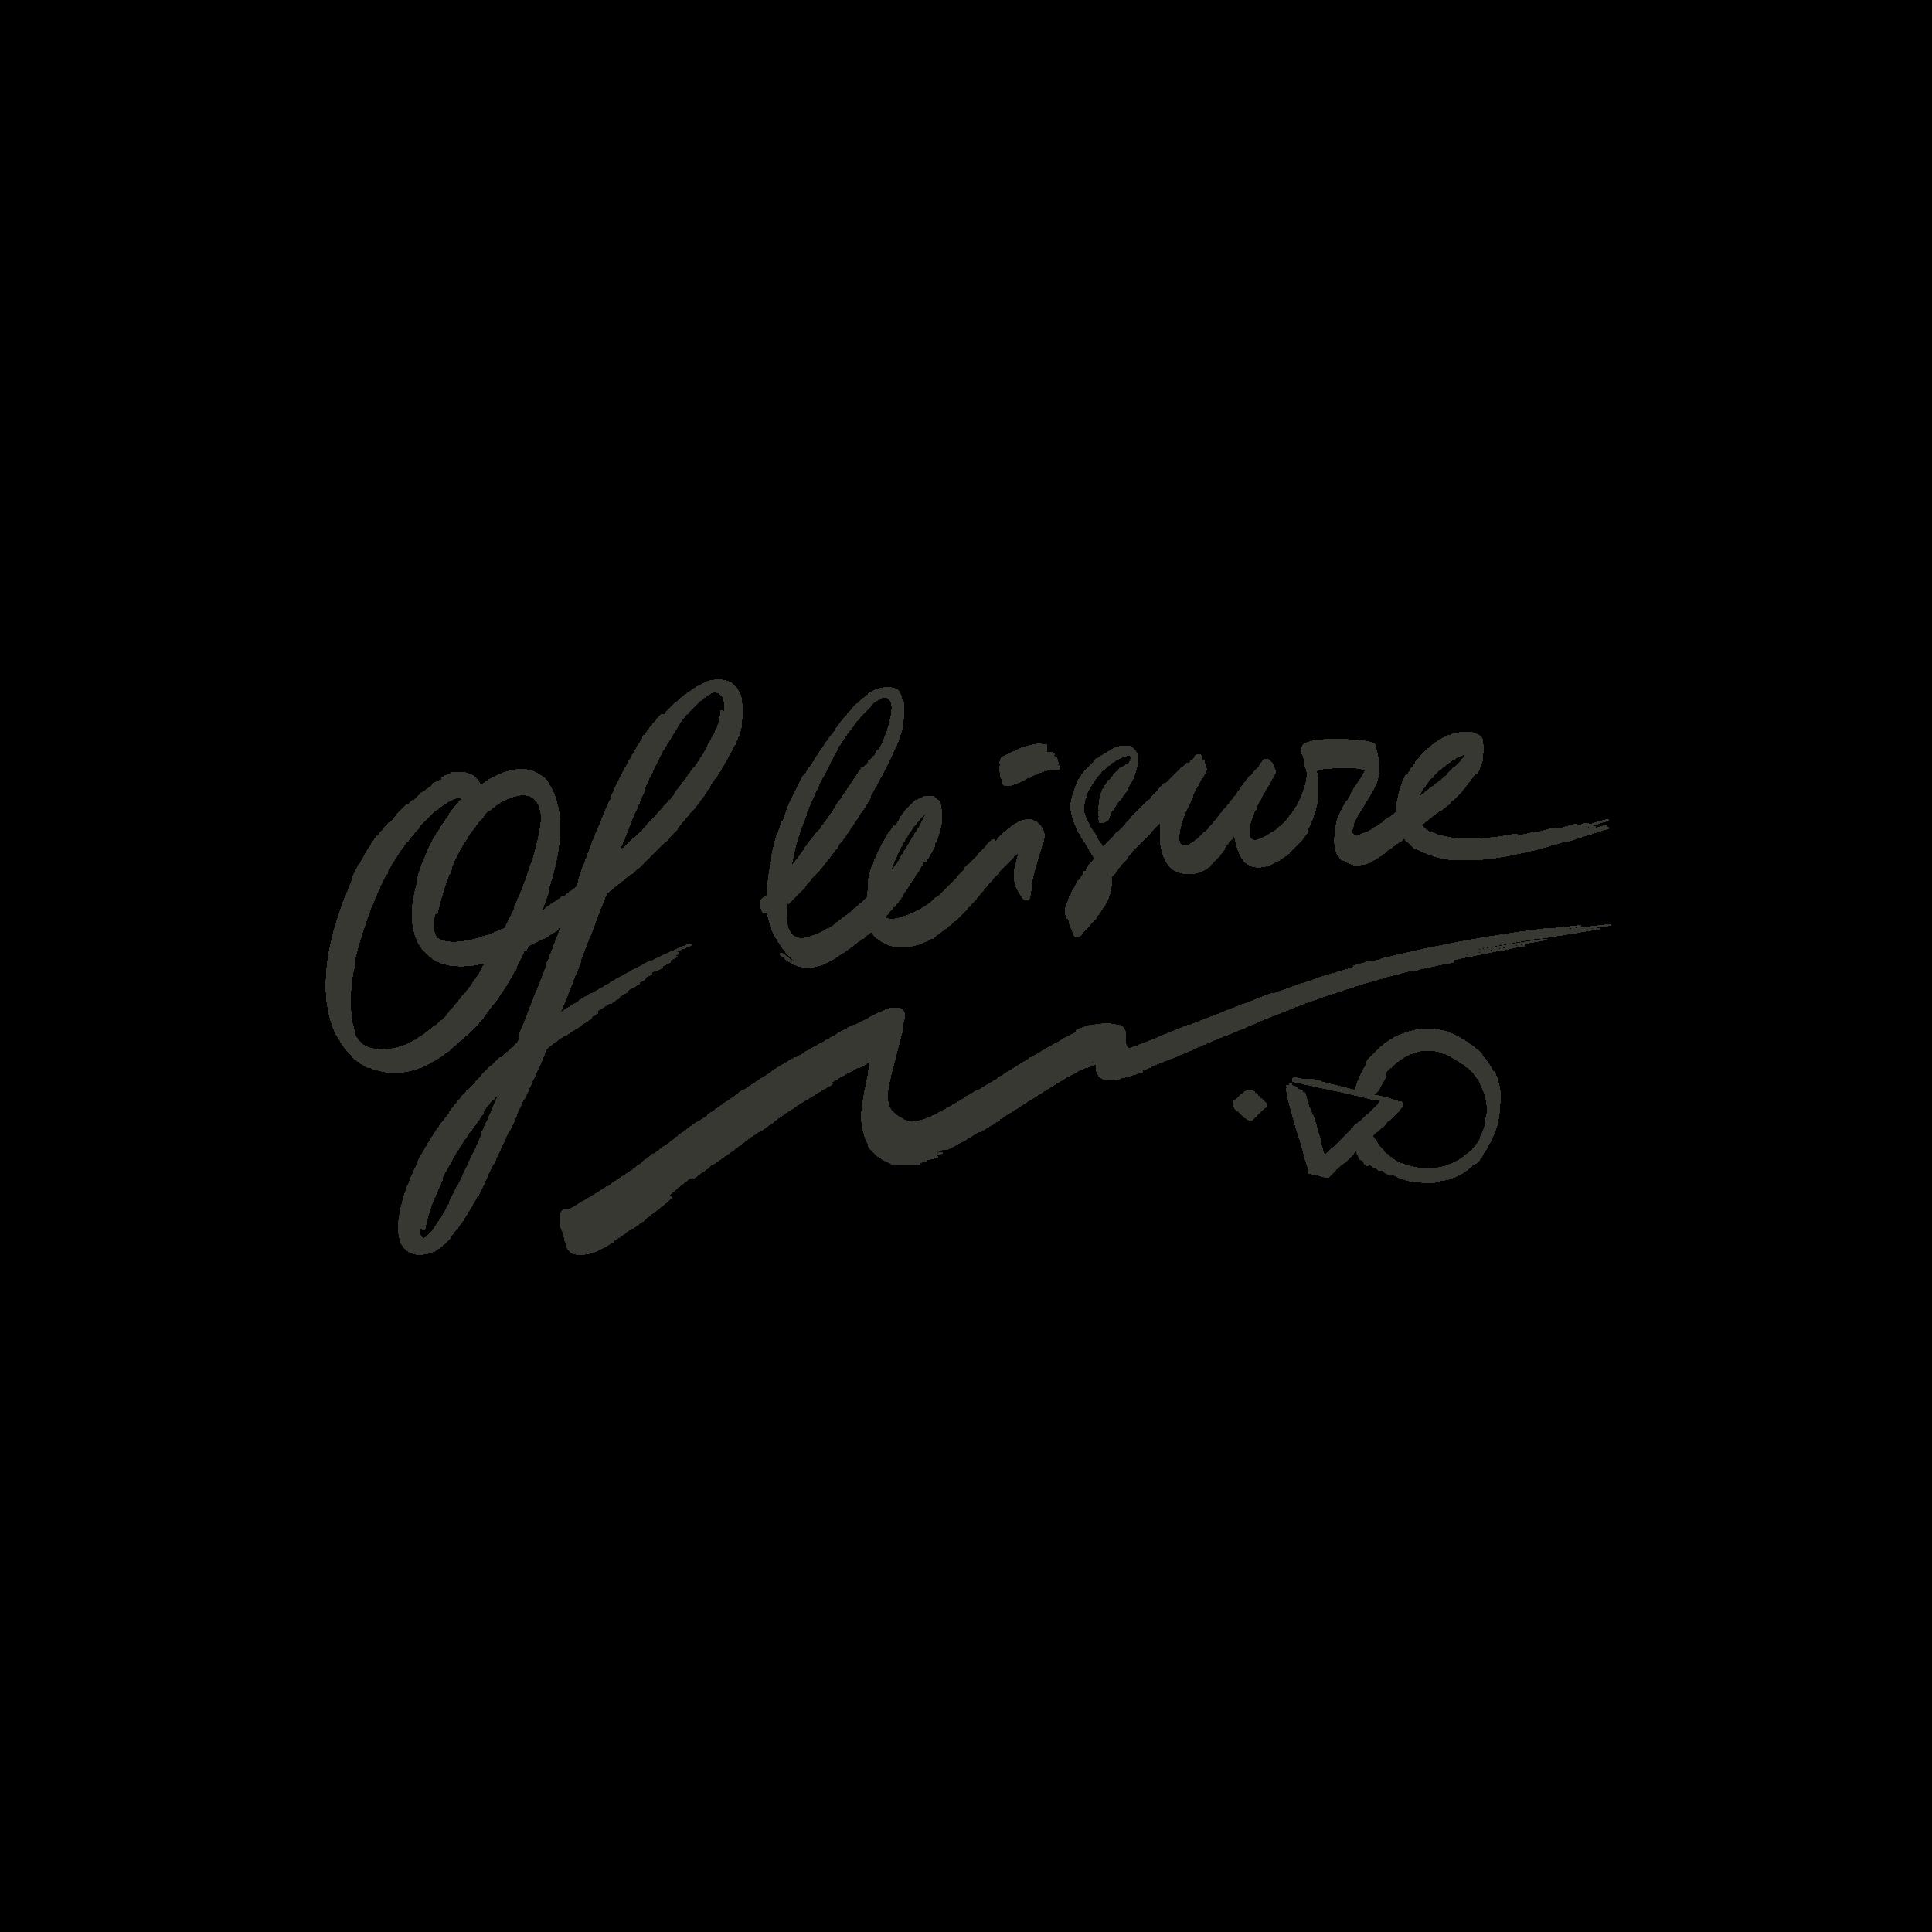 OfLeisure-logo@2x.png